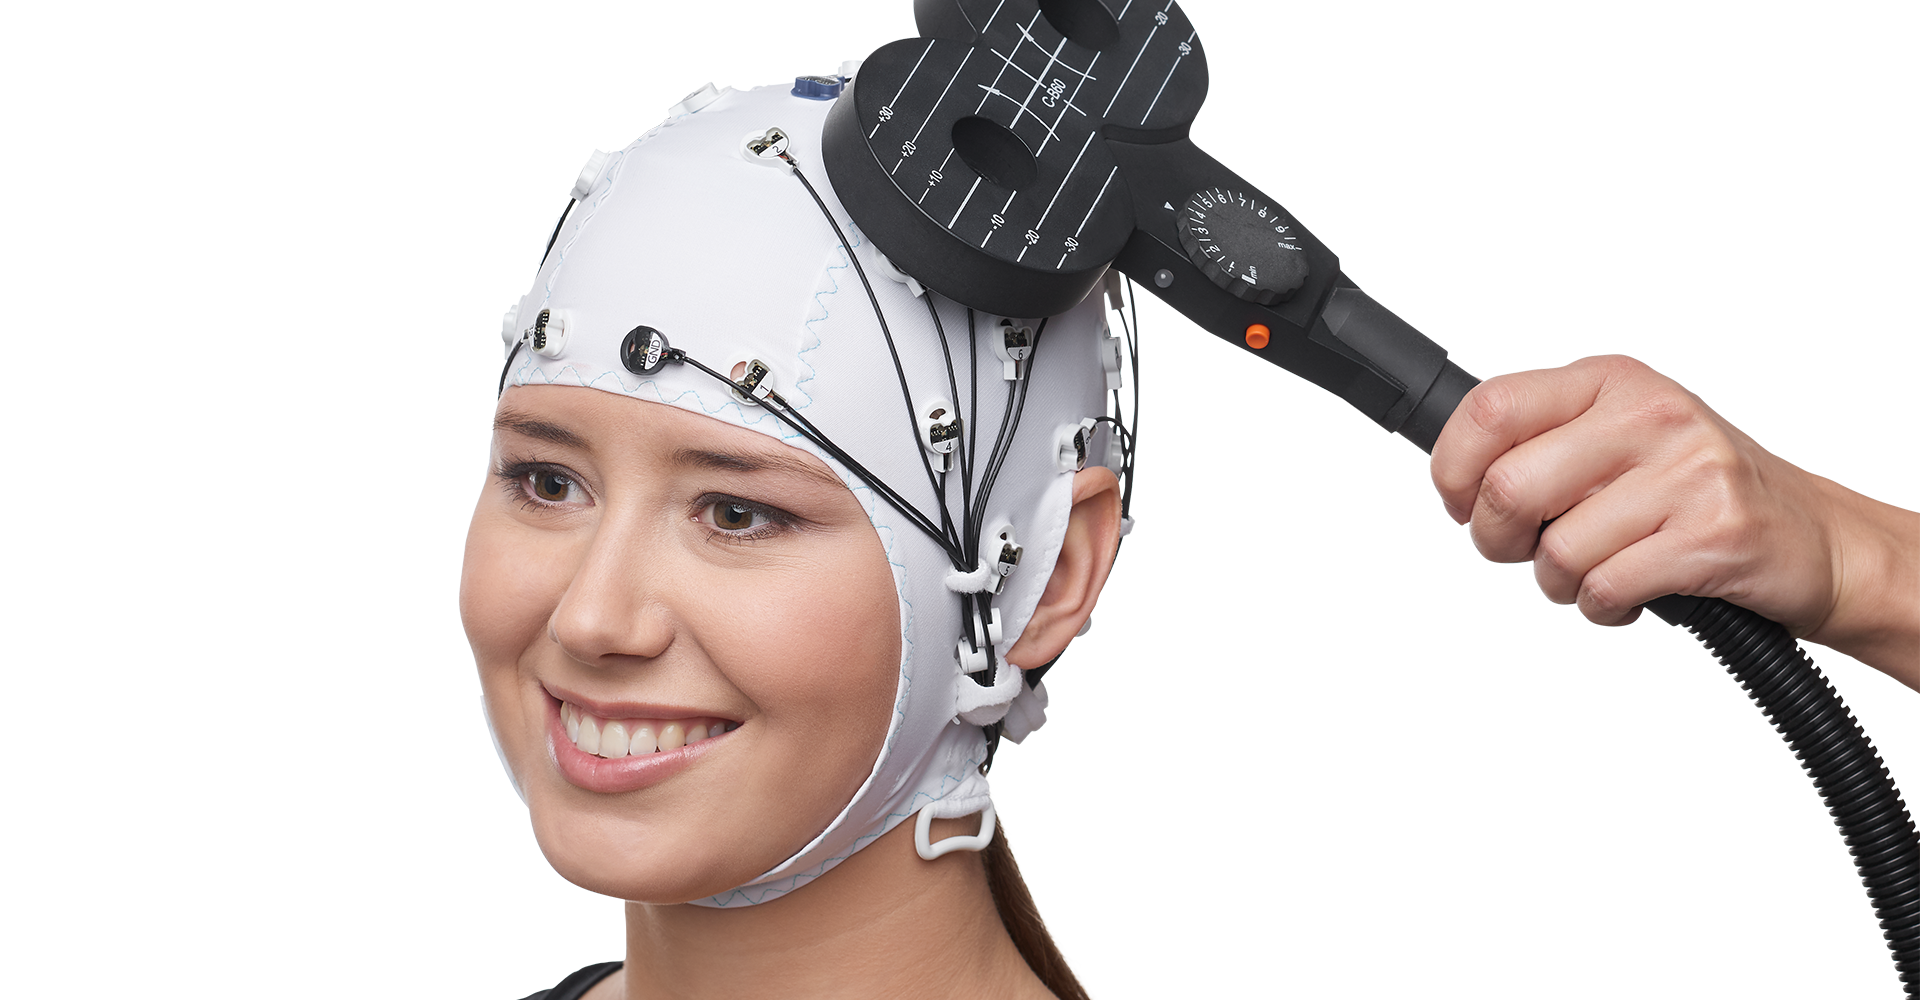 EEG & Brain Stimulation